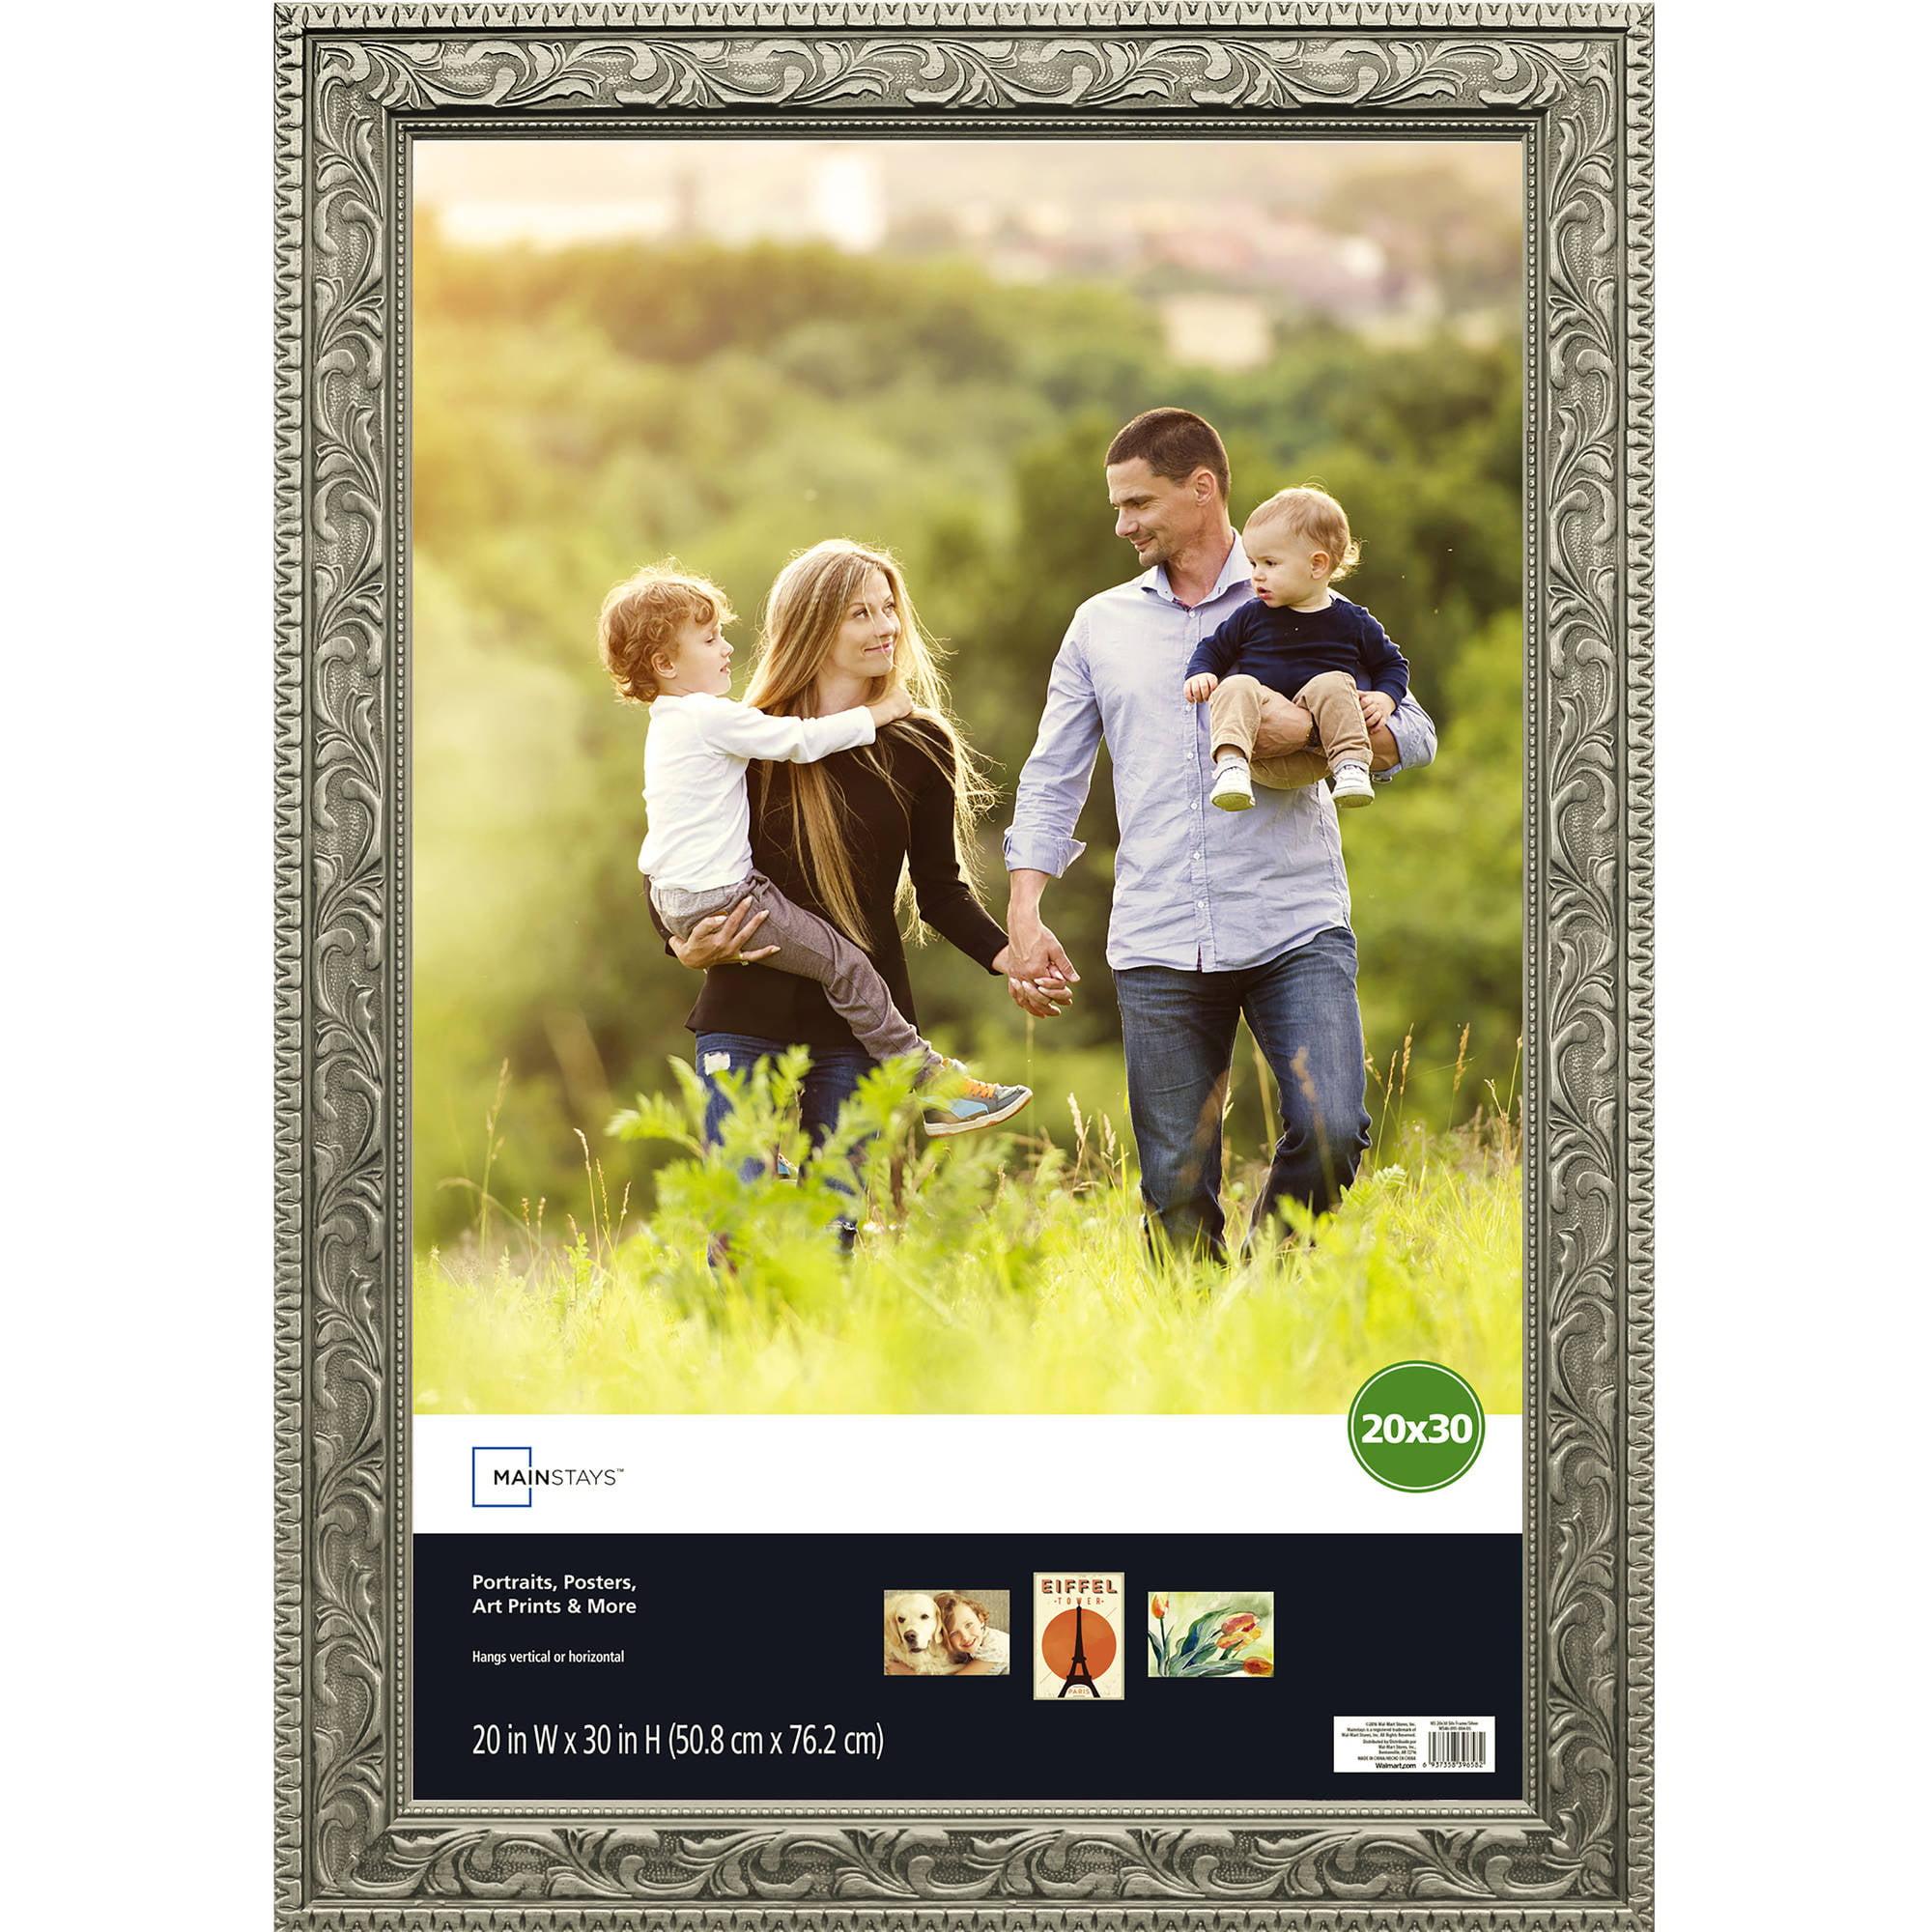 Mainstays 20x30 Silver Poster Frame - Walmart.com